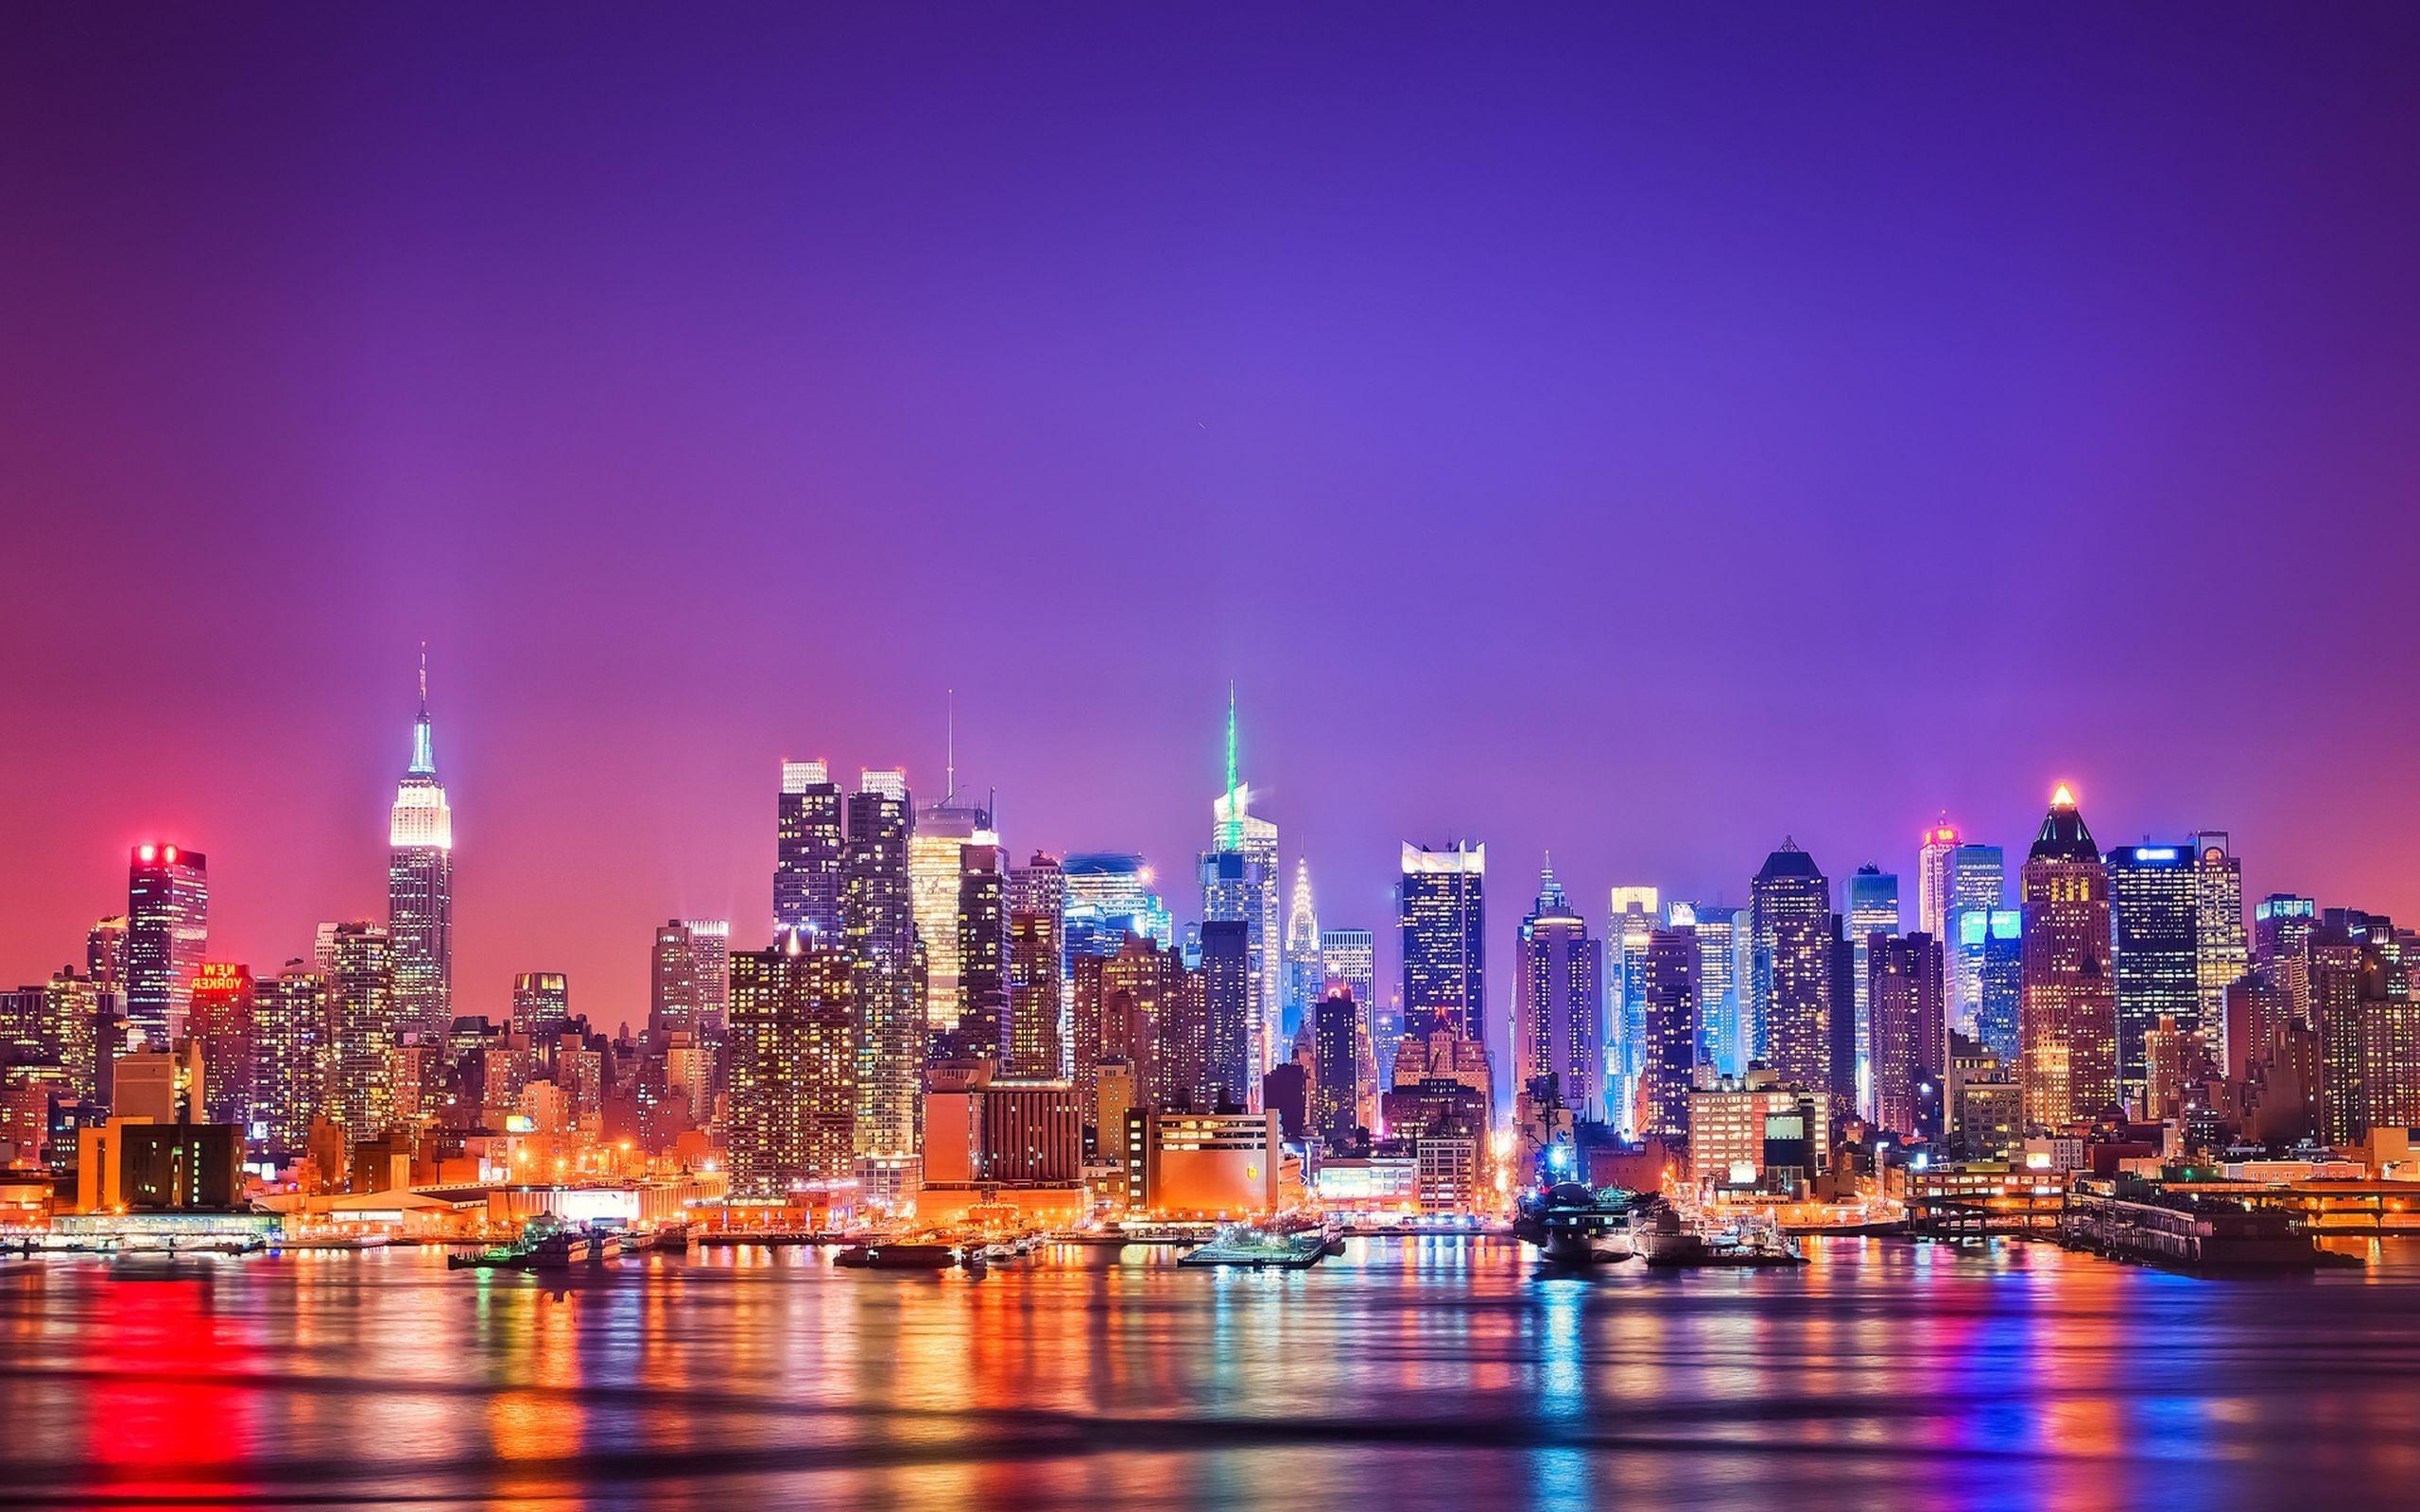 95 New York City Skyline Wallpapers On Wallpapersafari